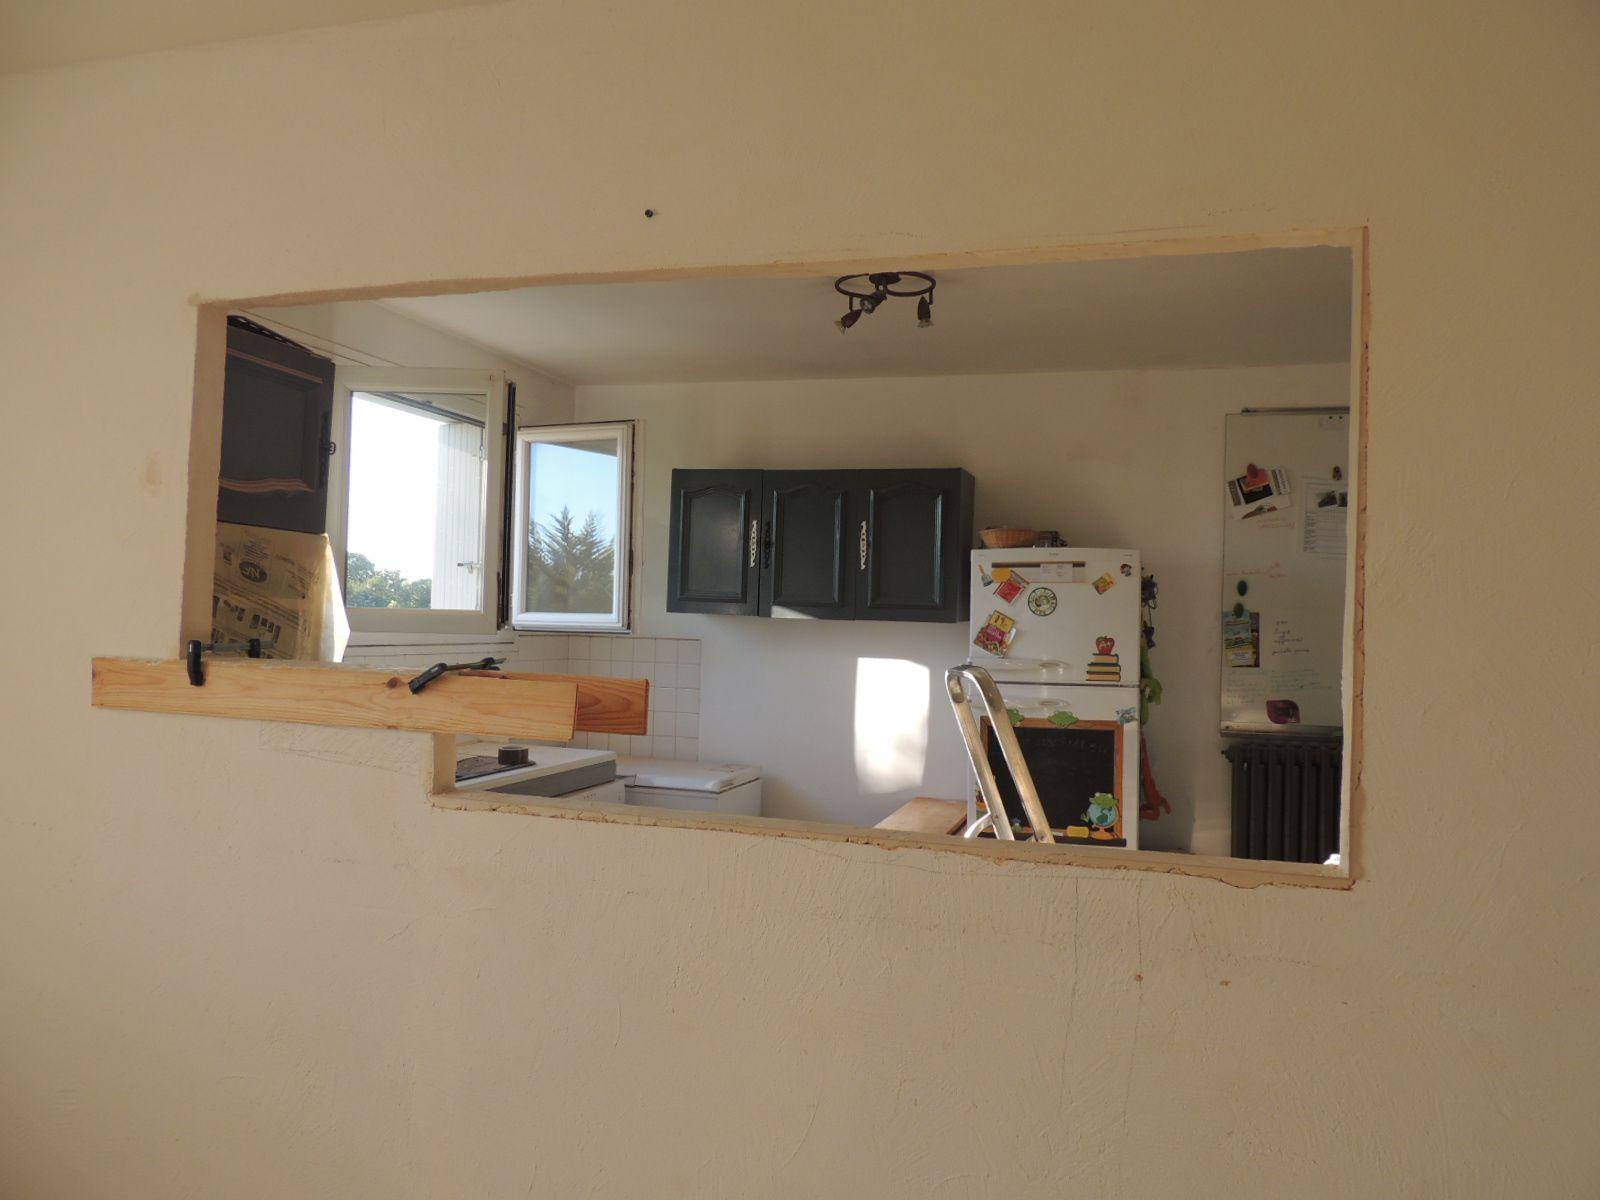 cuisine semi ouverte le blog de malo samuel et soline. Black Bedroom Furniture Sets. Home Design Ideas